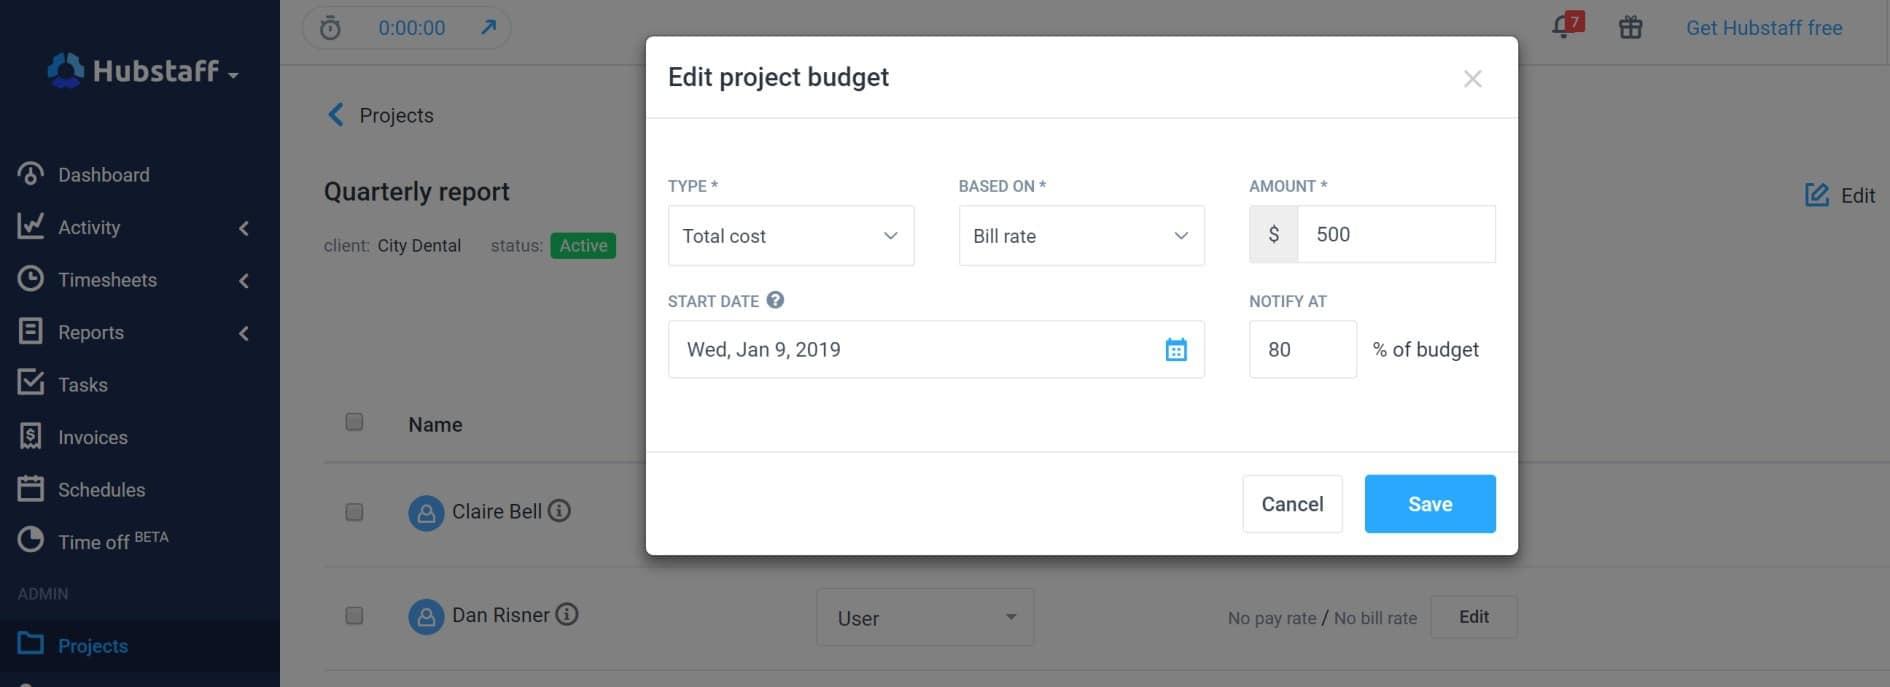 adding budgets in hubstaff